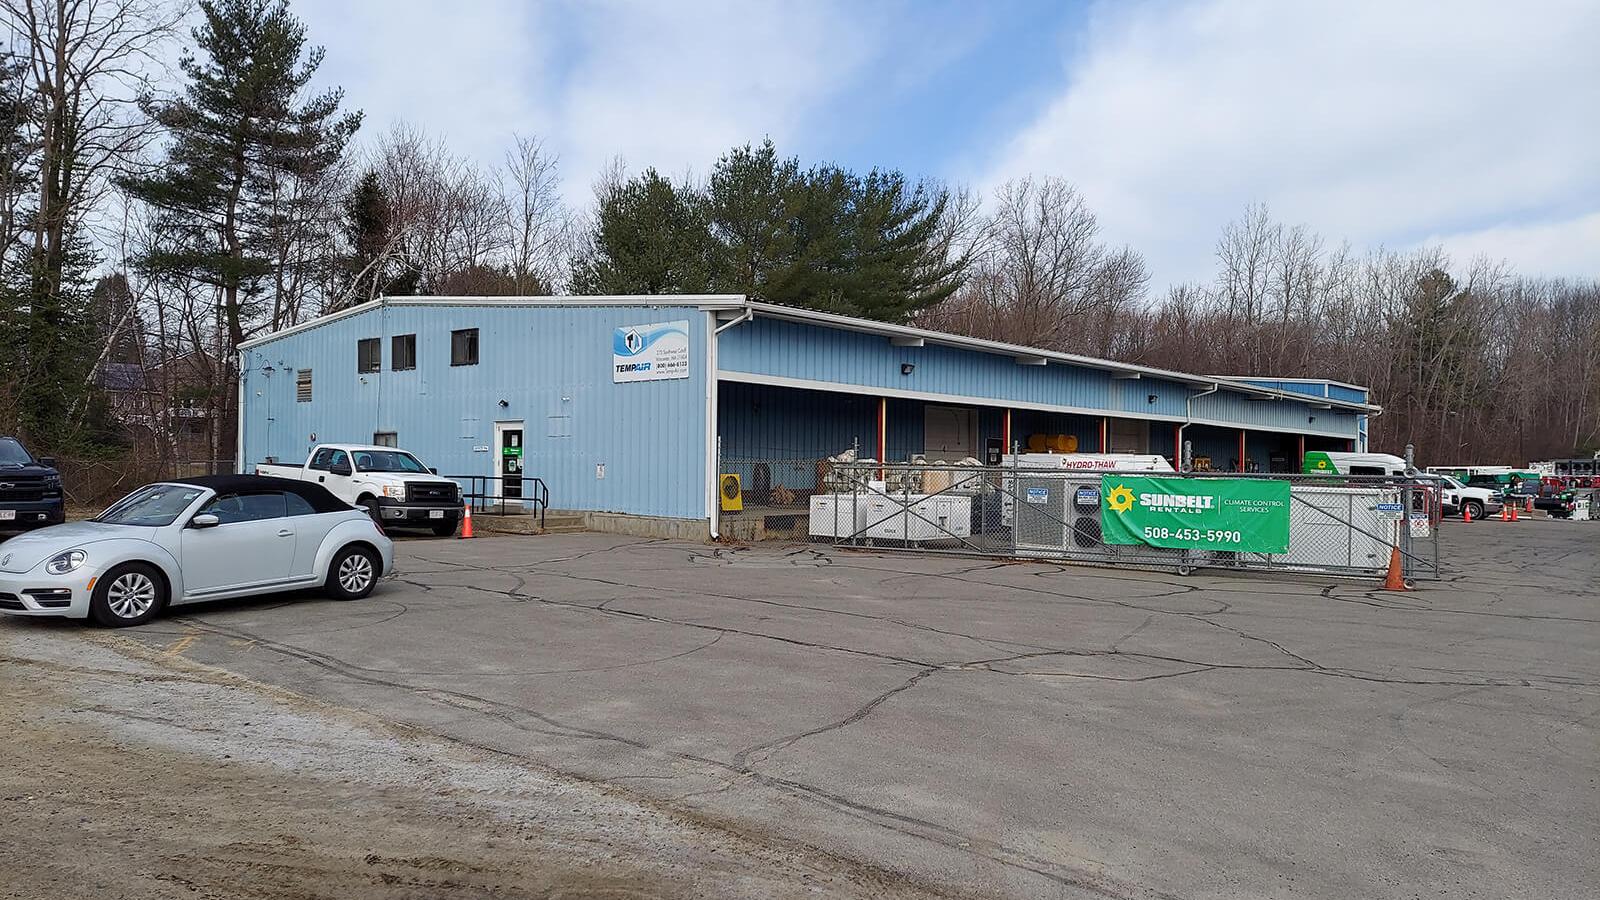 270 Southwest Cutoff, Worcester, Massachusetts 01604, Industrial,For Lease,Southwest Cutoff,1332